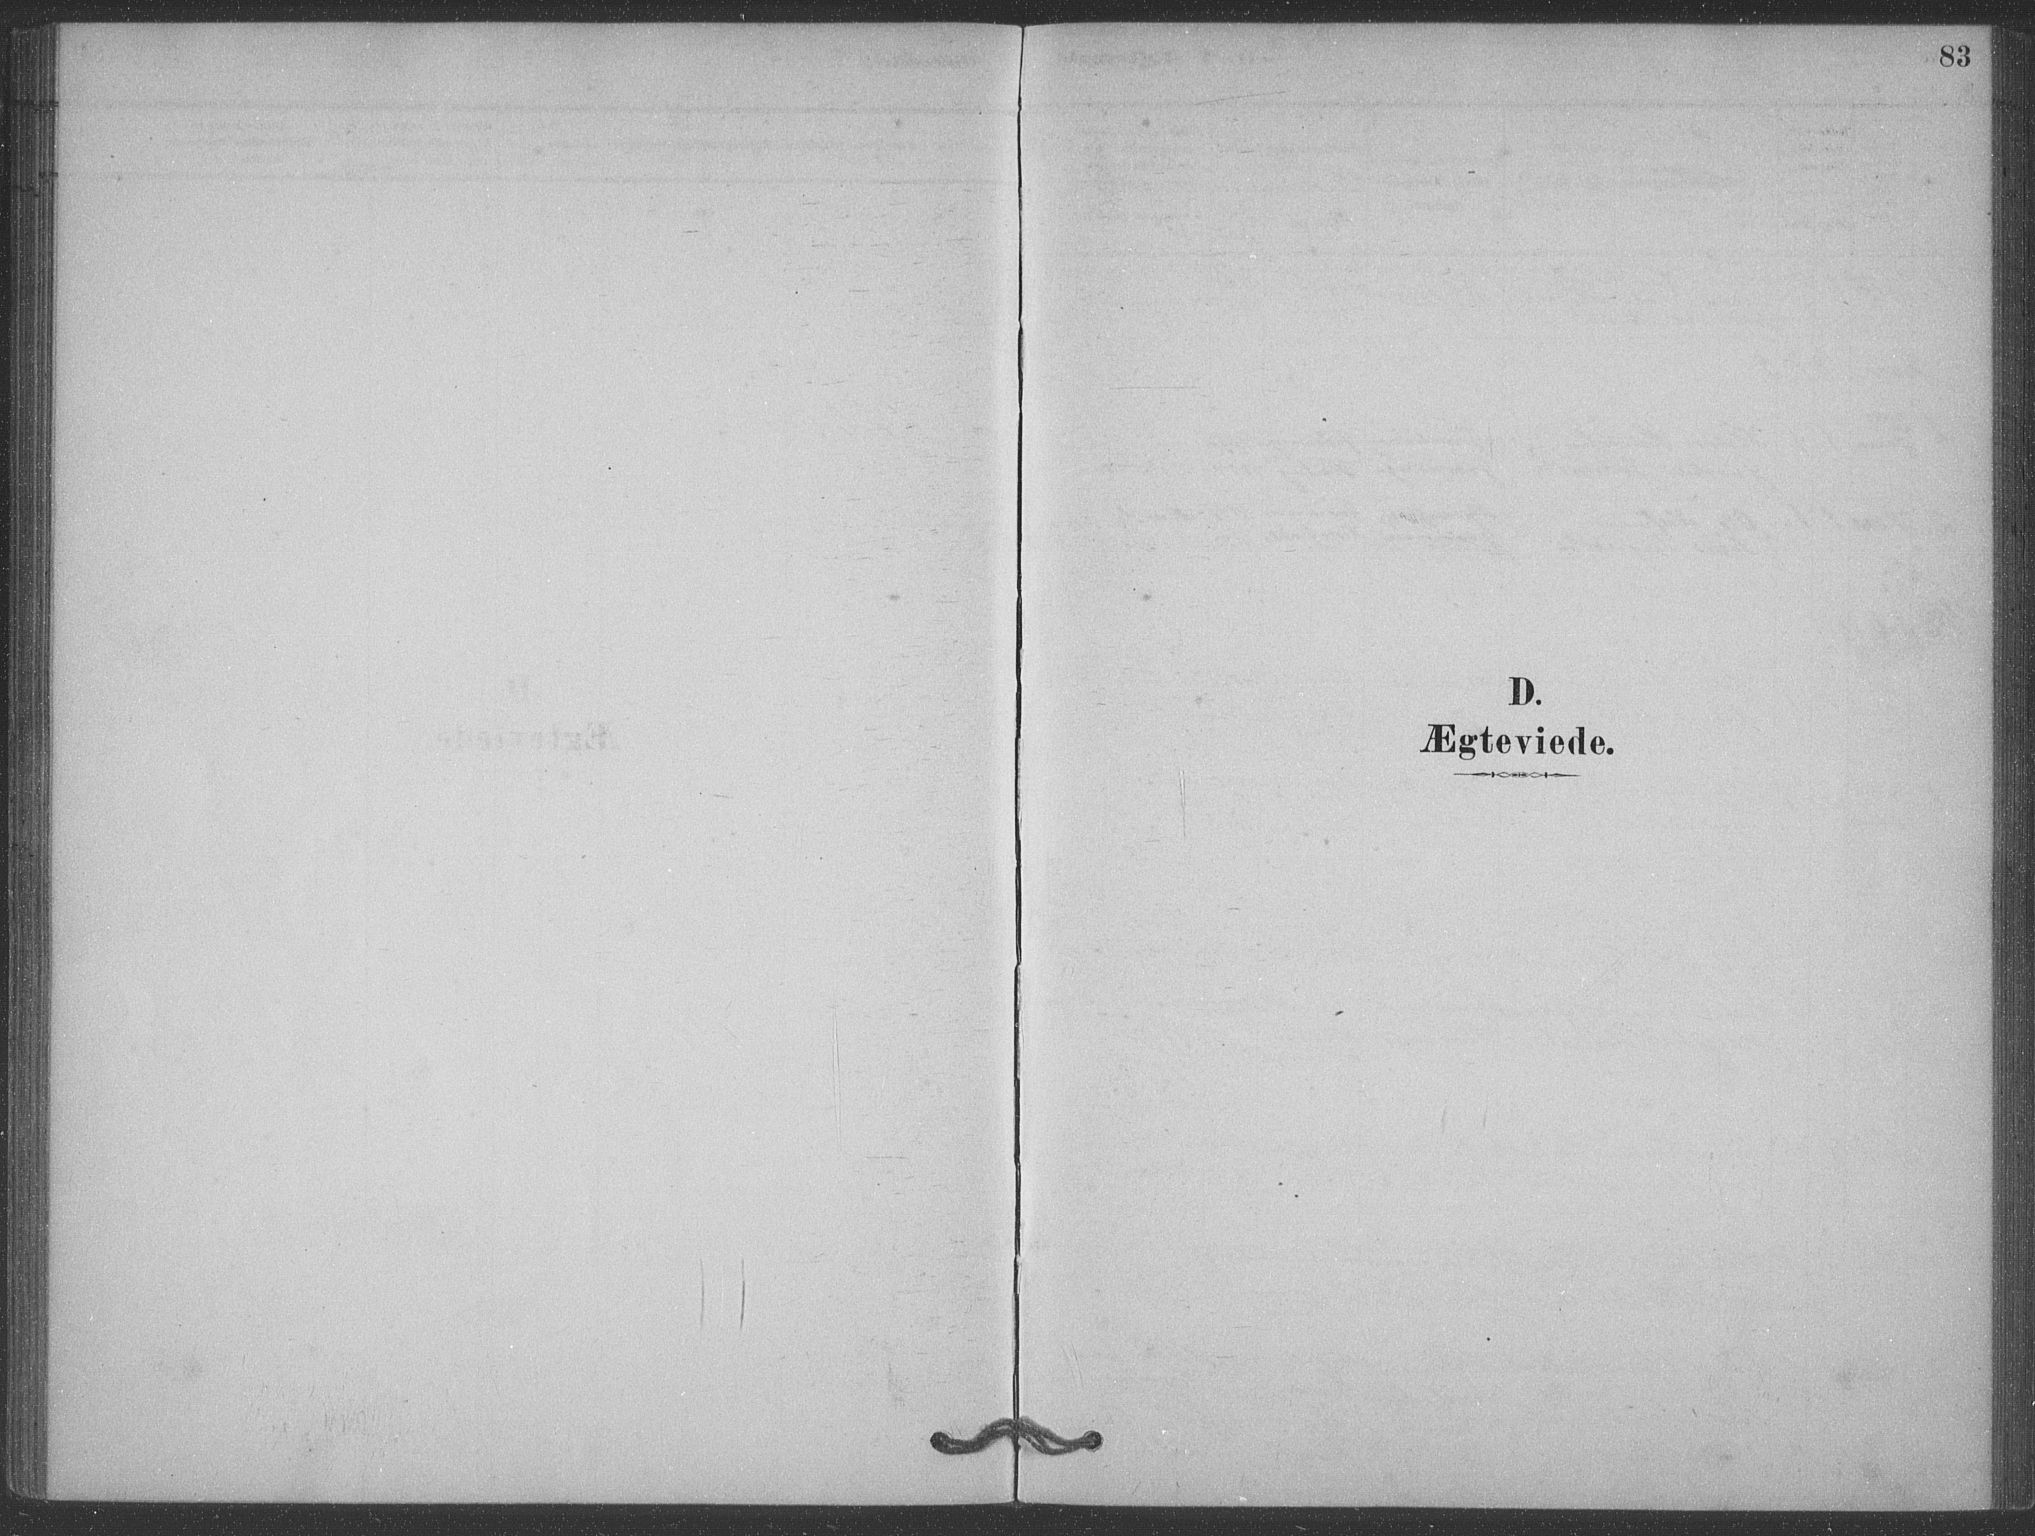 SAKO, Heddal kirkebøker, F/Fb/L0002: Ministerialbok nr. II 2, 1878-1913, s. 83